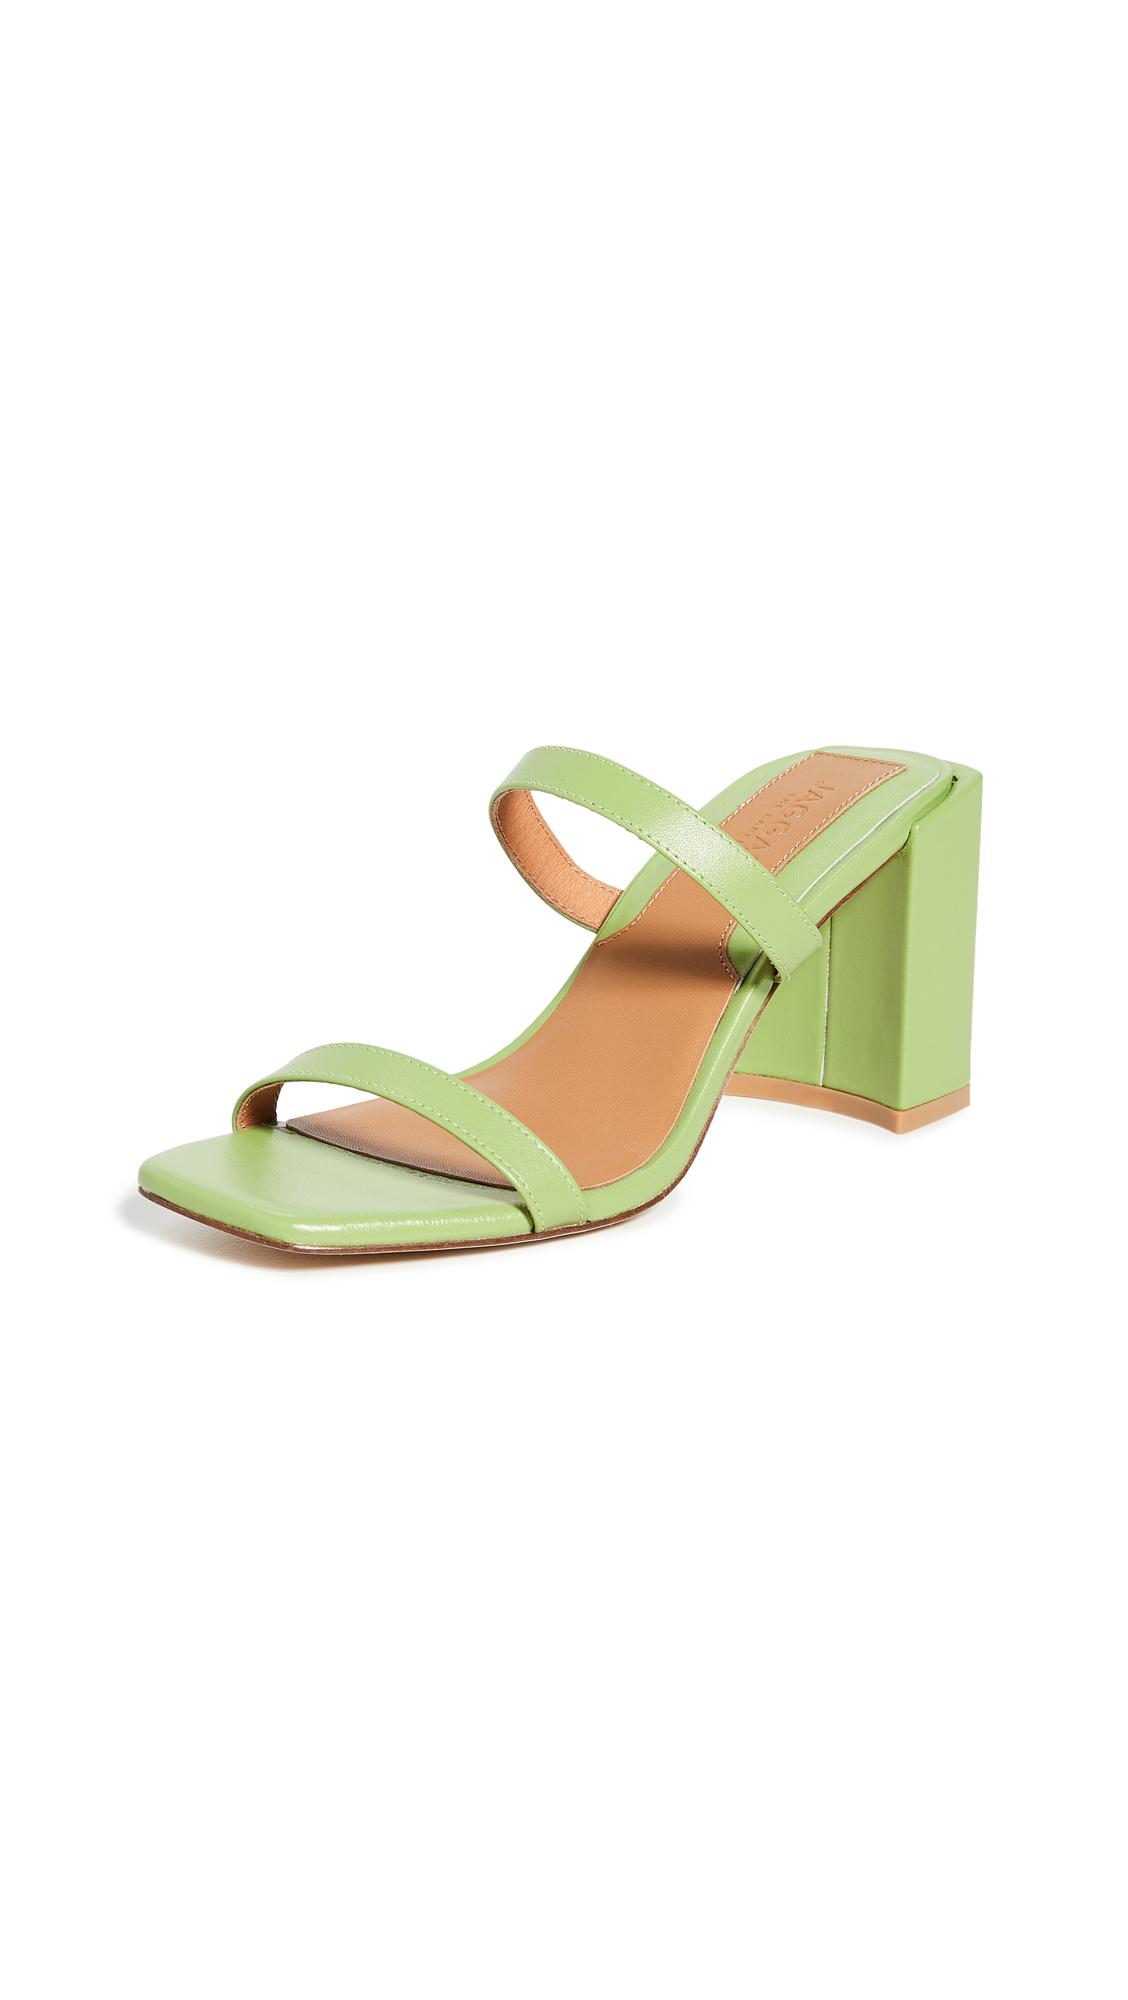 JAGGAR Square Heel Sandals